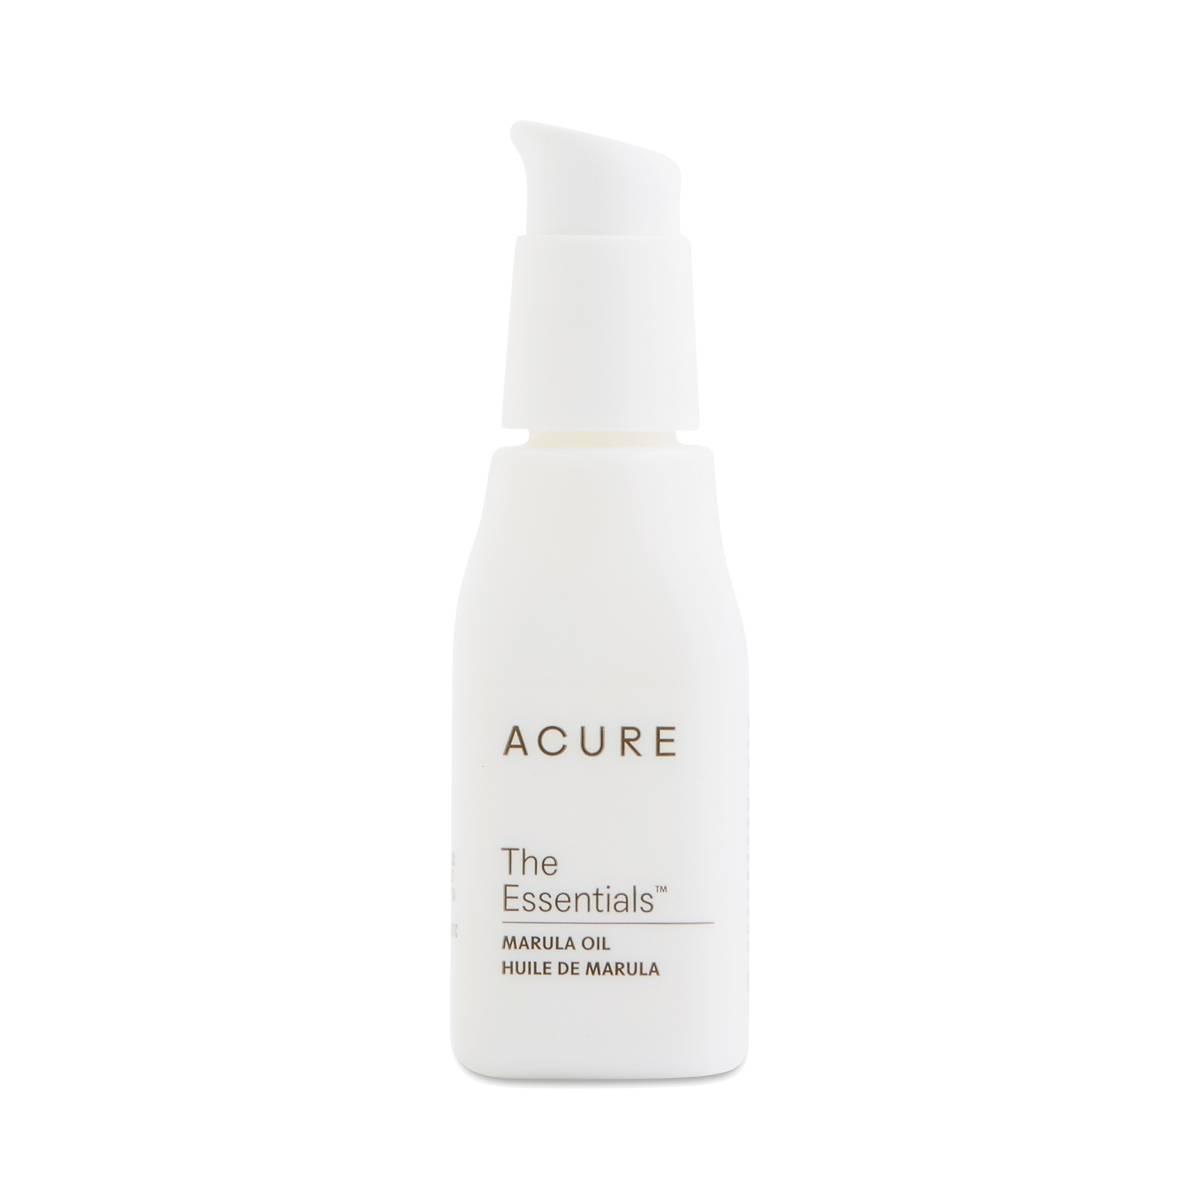 Marula Oil By Acure Organics